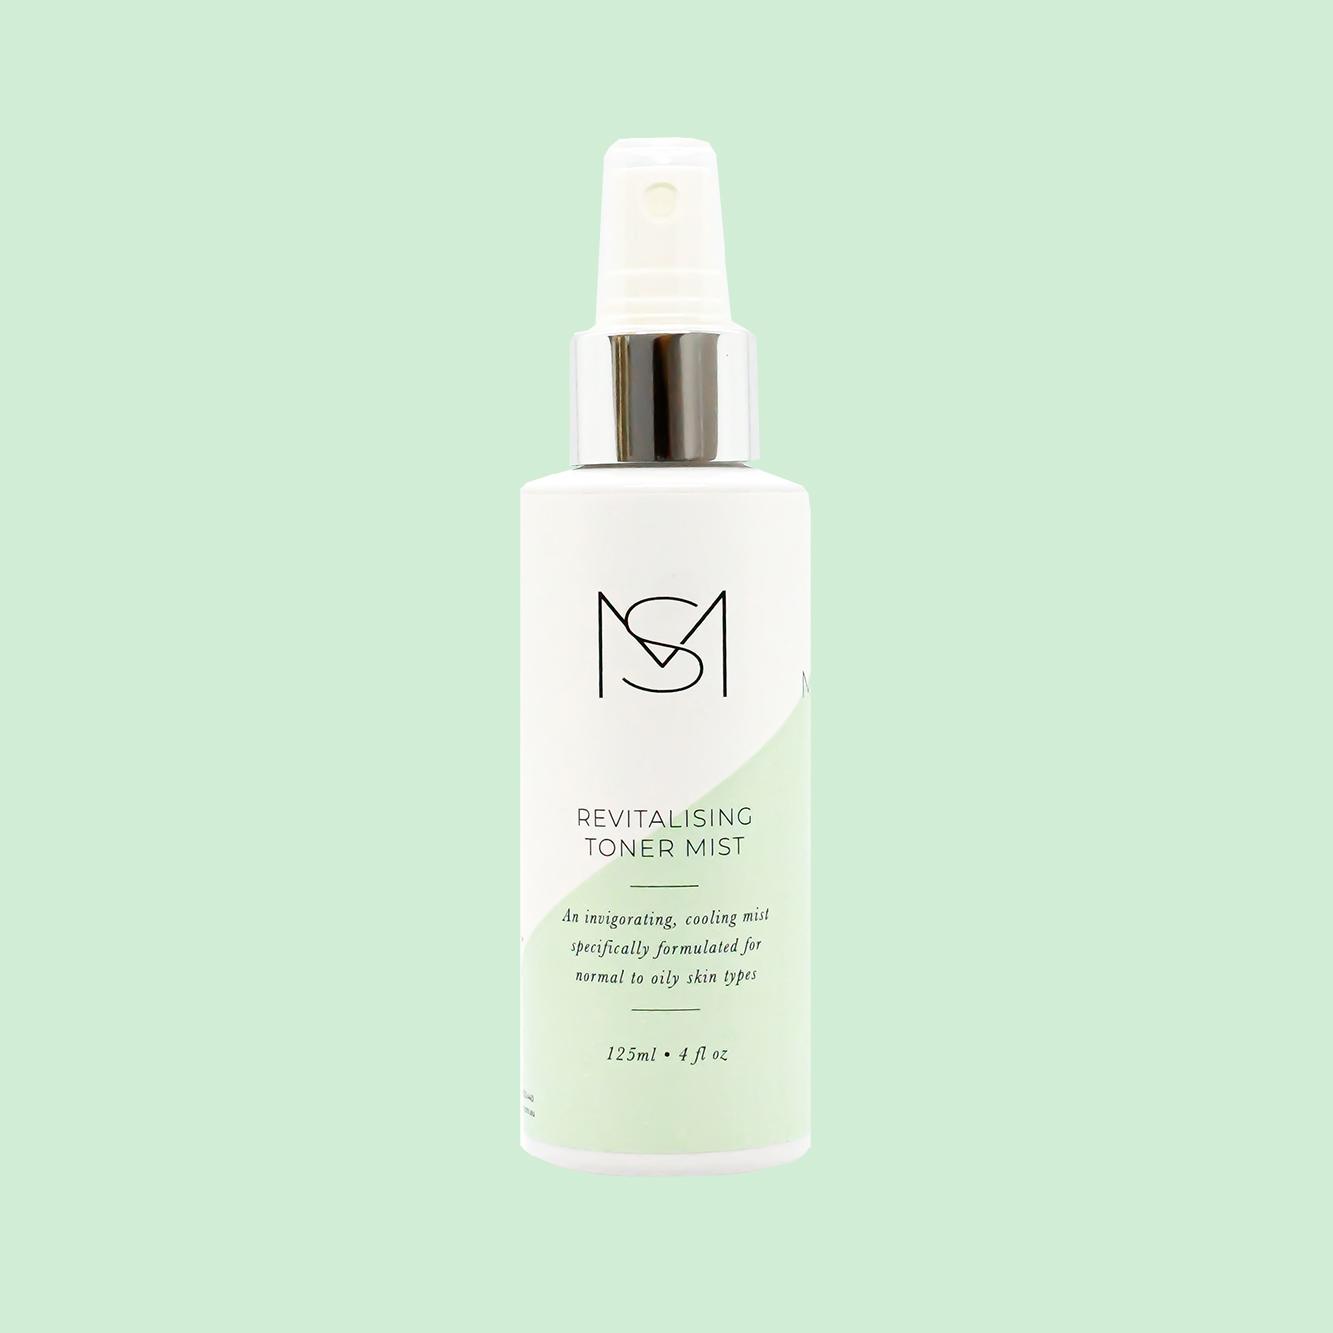 Revitalising Toning Mist 125mL - Australian made skincare by Mariella Skin Perth 01